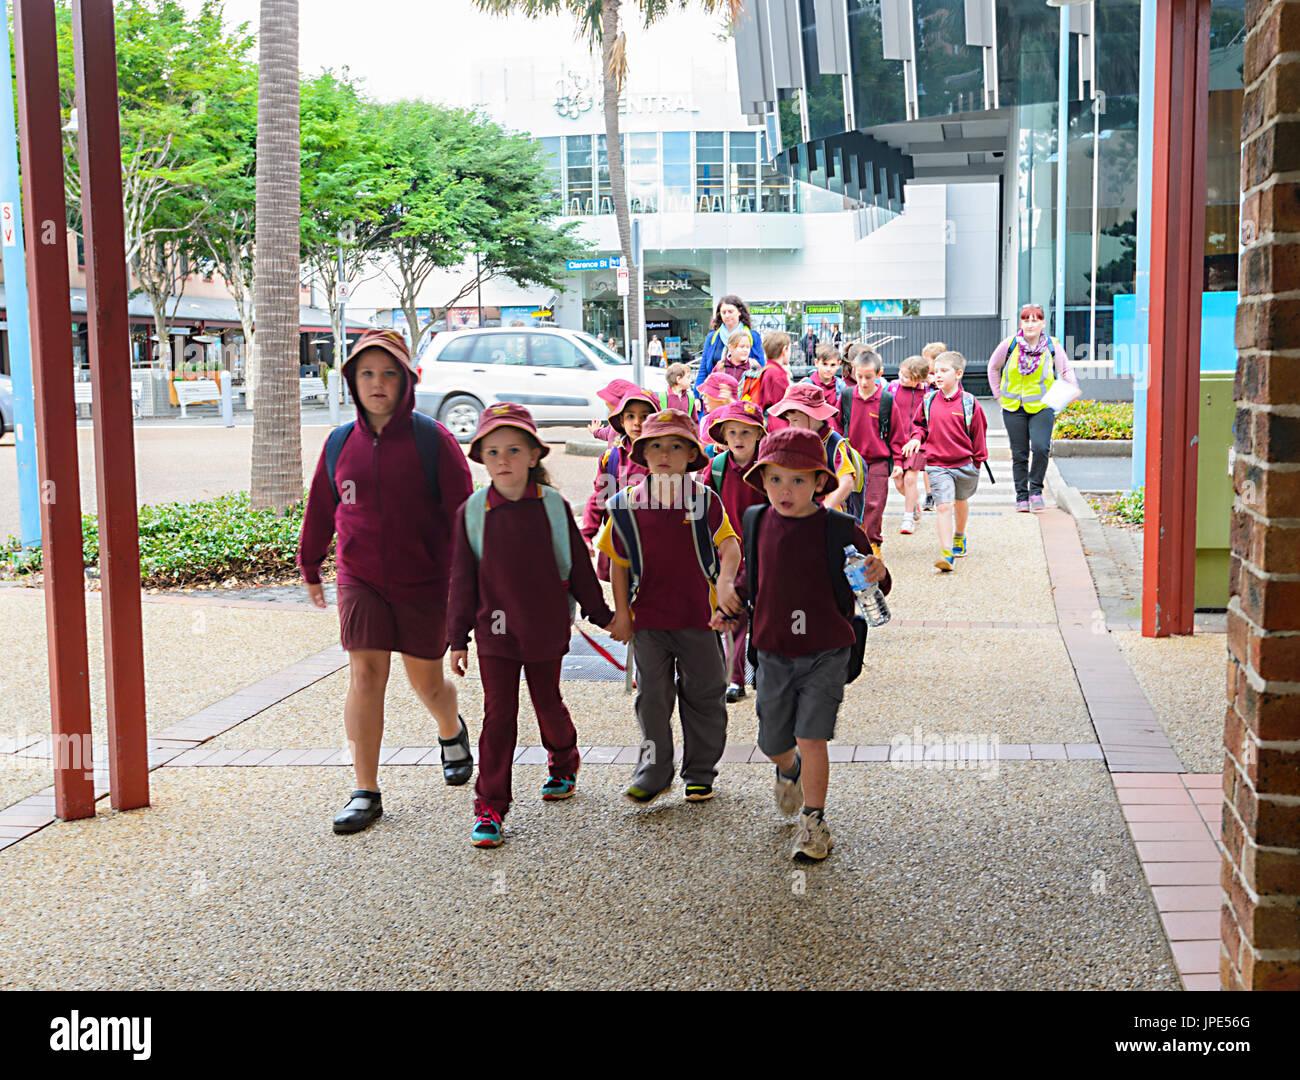 Schoolchildren wearing their school uniform walking in the street on a school day outing, Port Macquarie, New South Wales, NSW, Australia - Stock Image